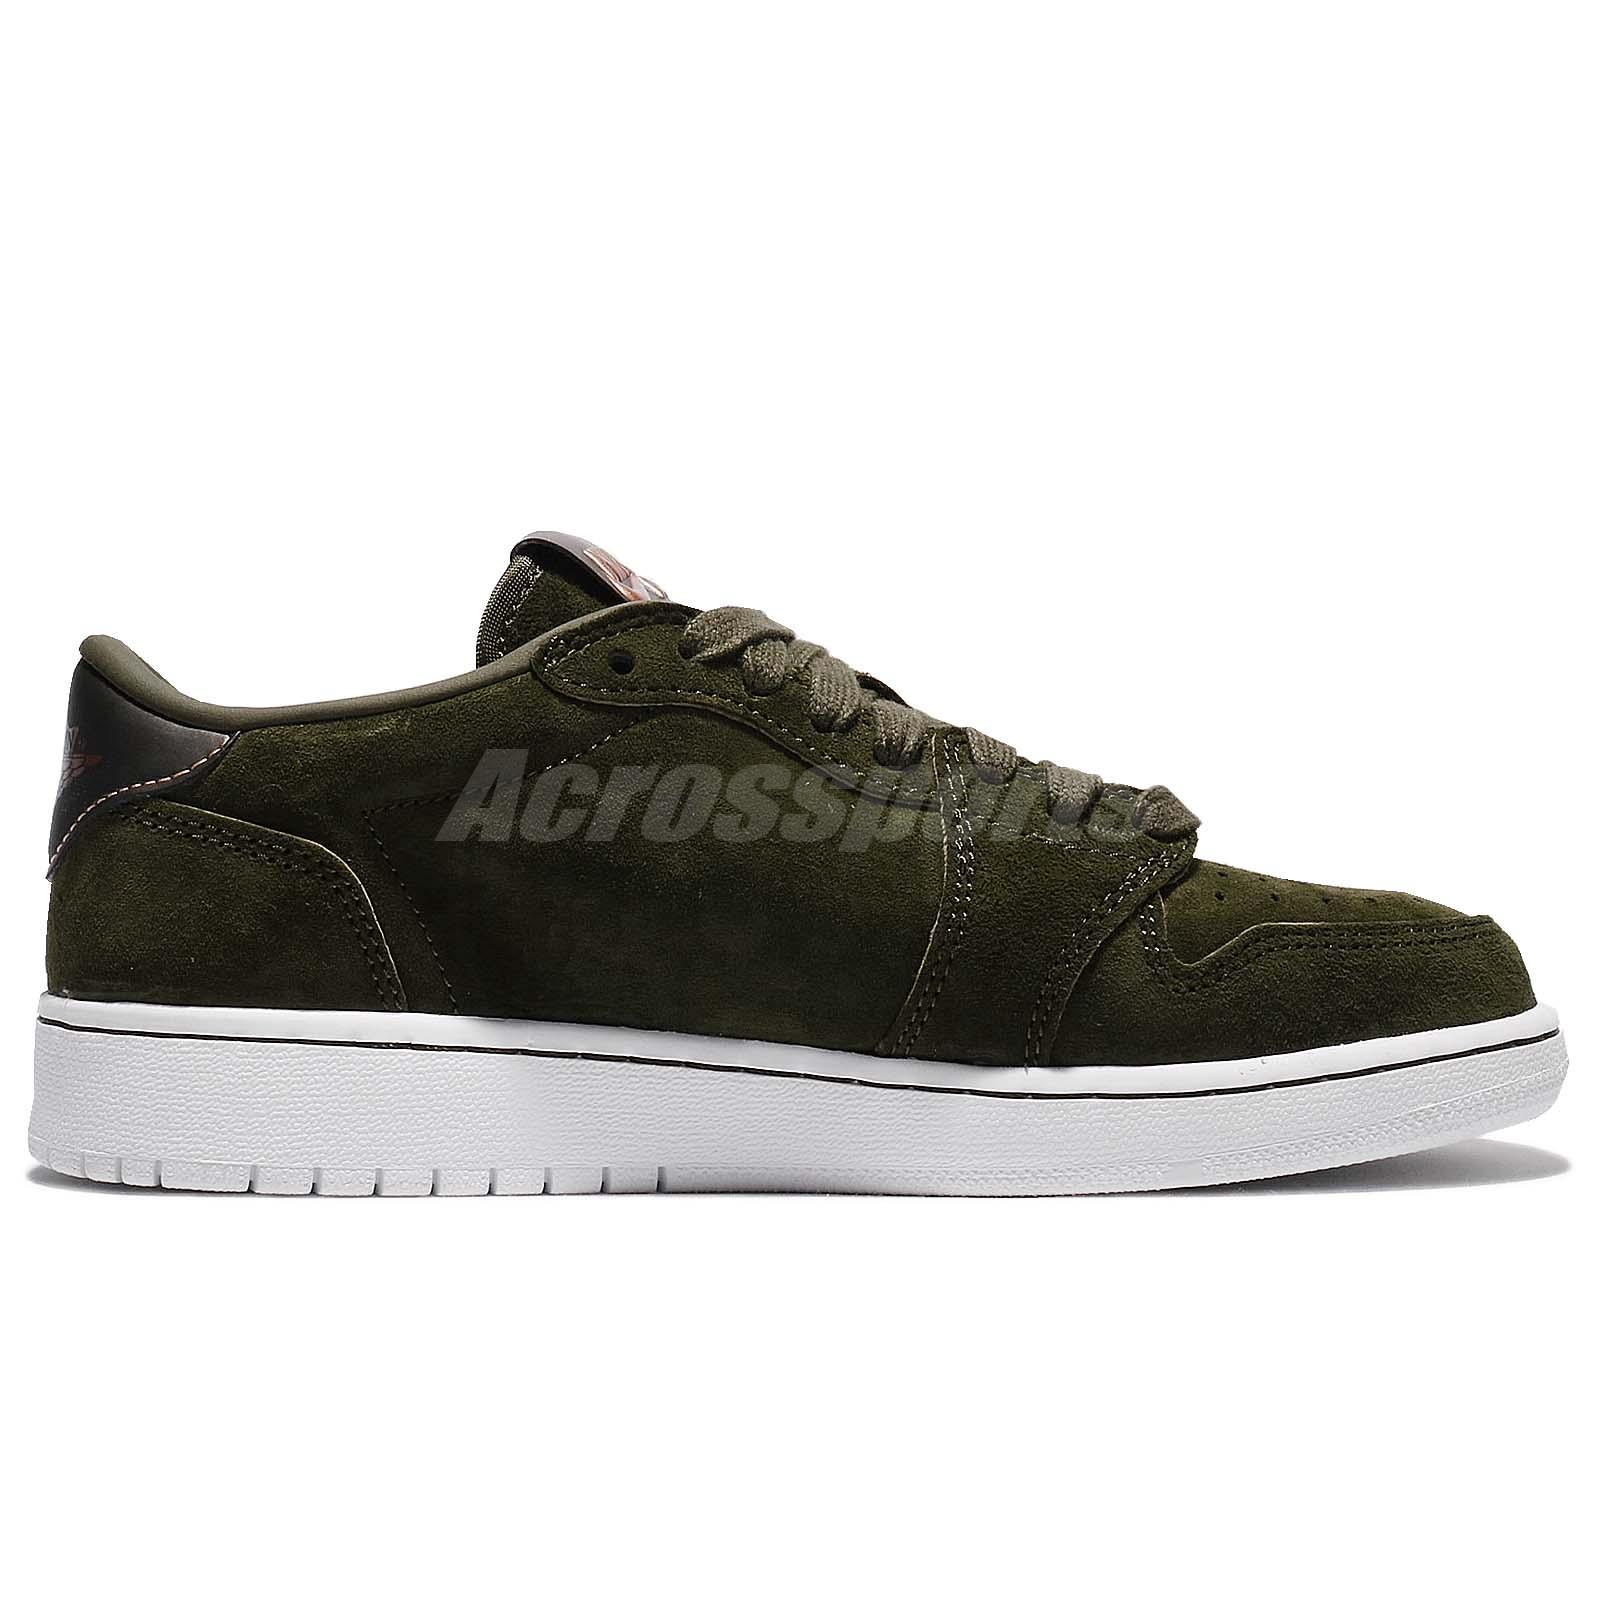 Nike Air Jordan 1 Retro Low Ns Hc Heiress Collection Legion Green Kid 919705-330 Women's Shoes